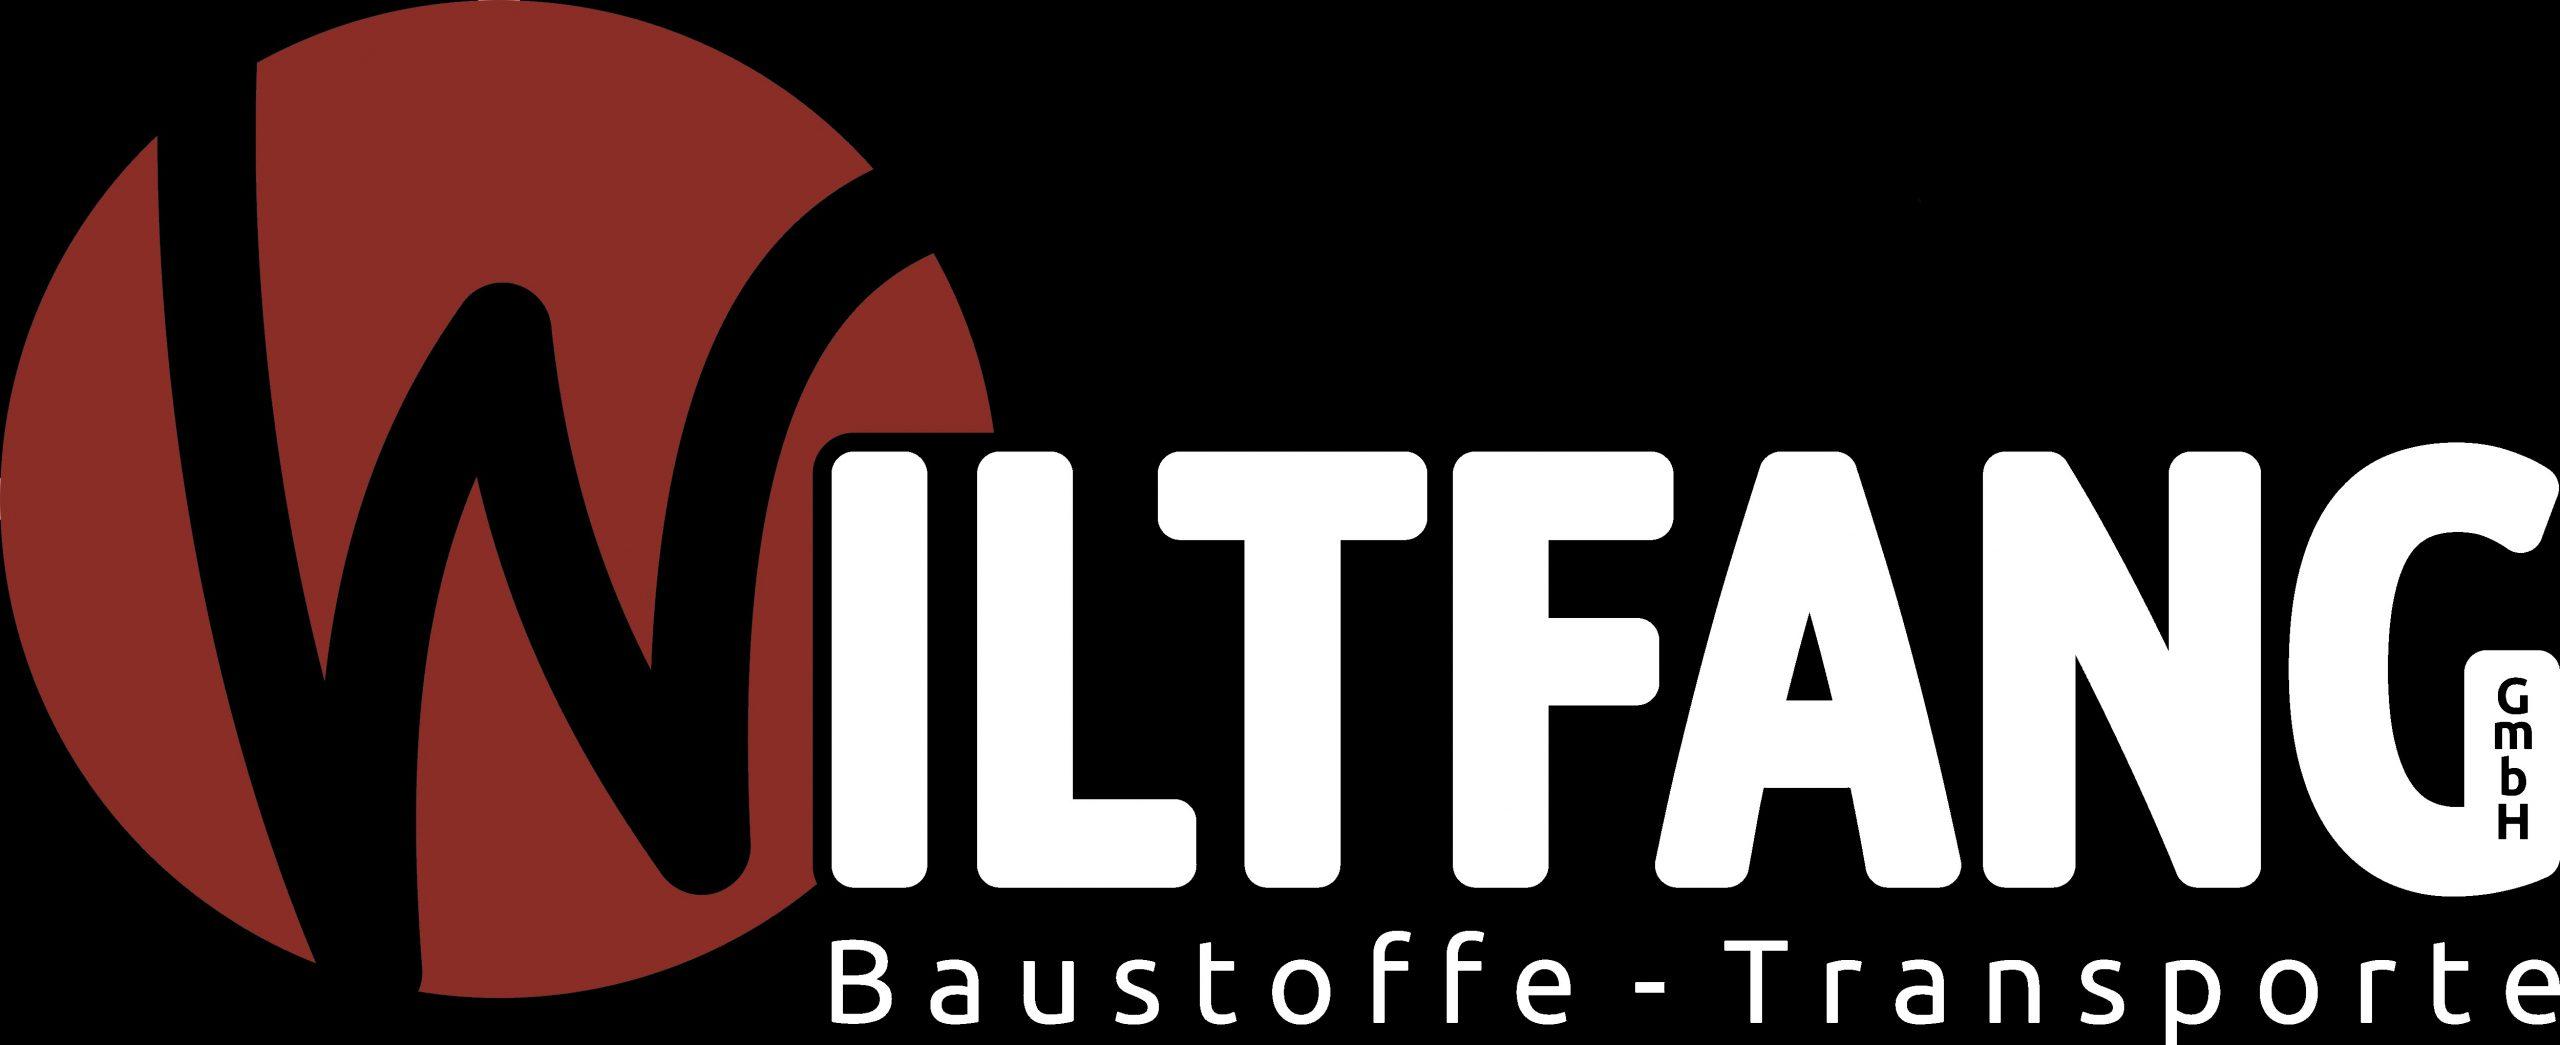 Wiltfang Baustoffe-Transporte GmbH